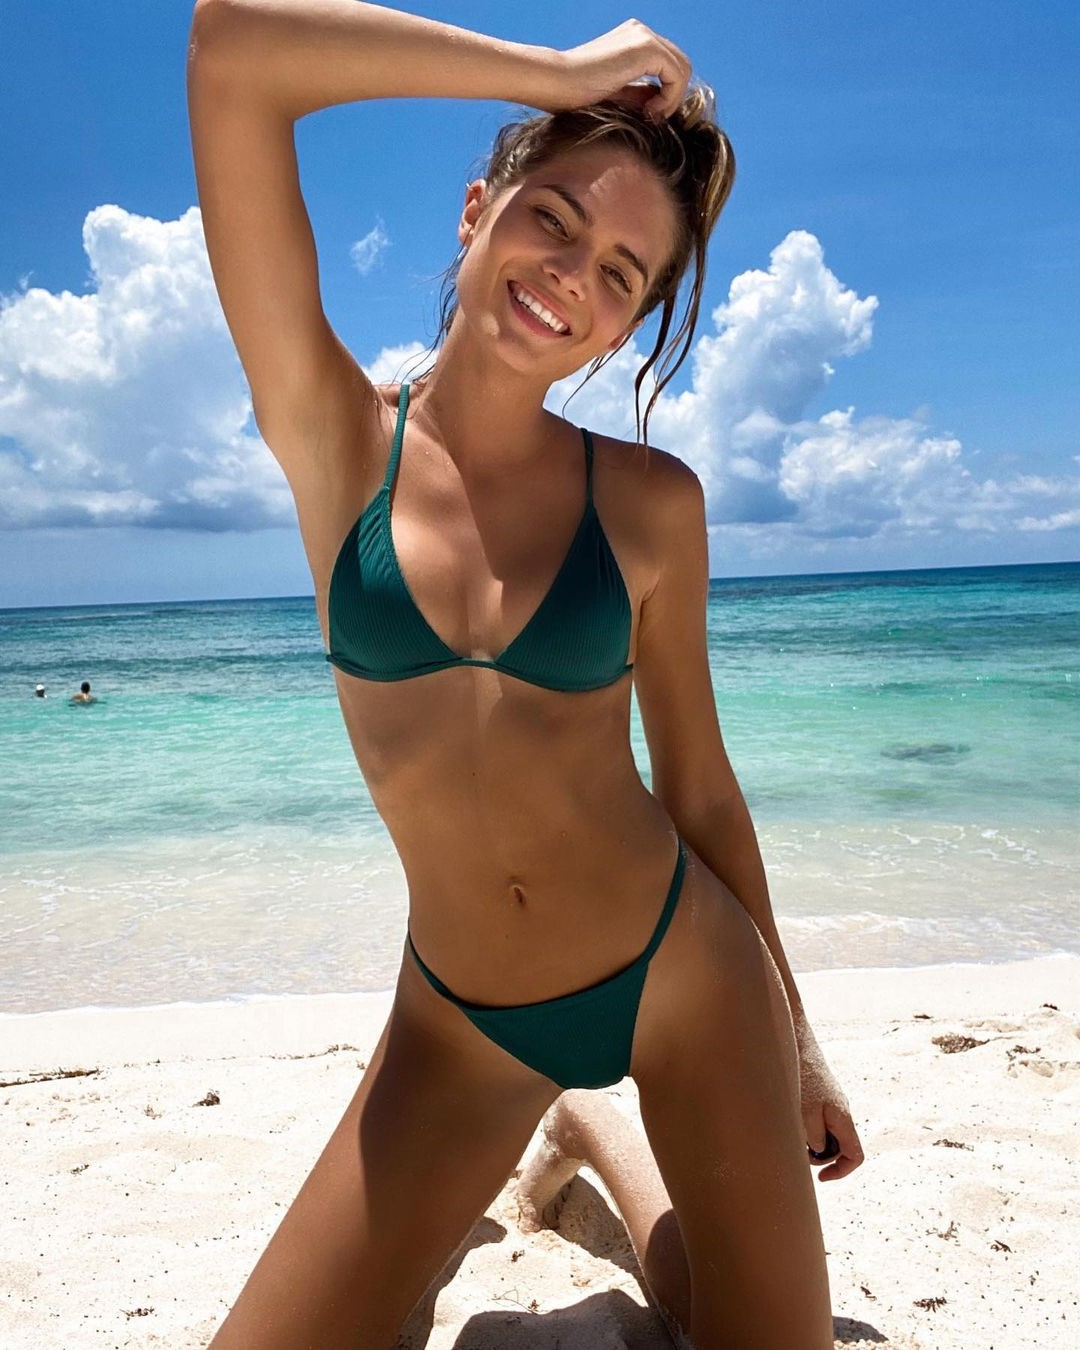 hottest british woman